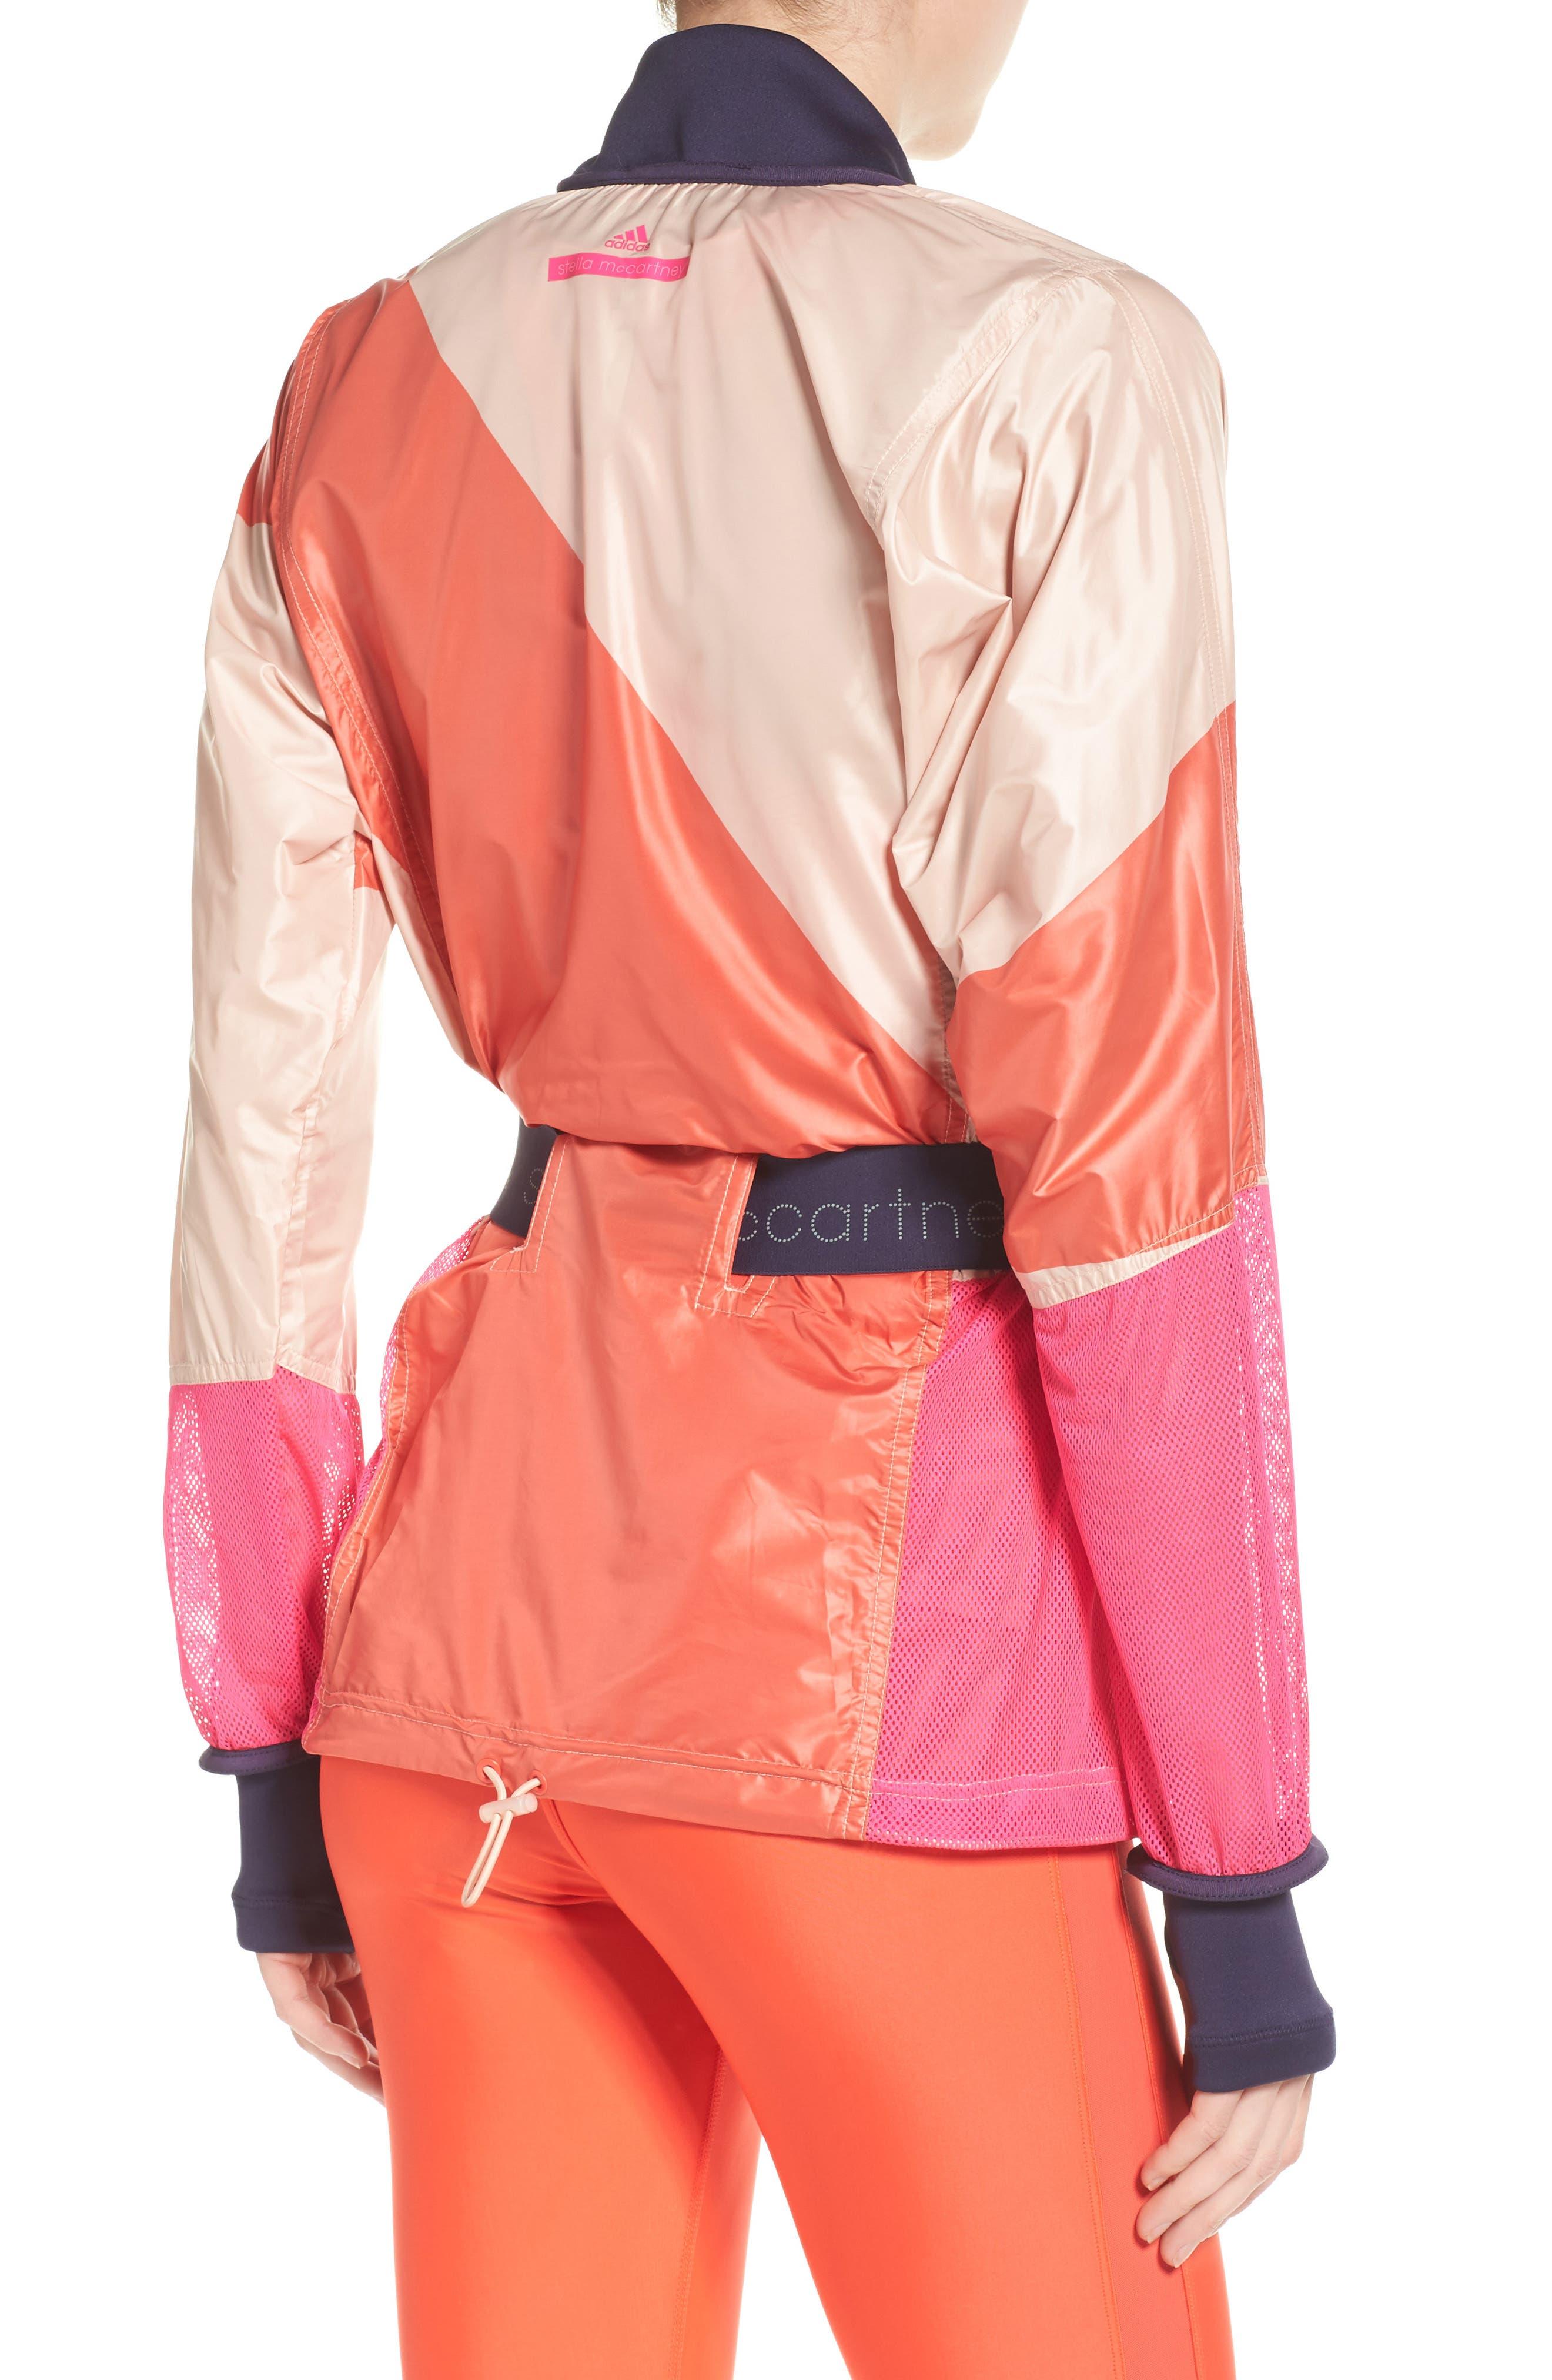 Kite Climastorm<sup>®</sup> Run Jacket,                             Alternate thumbnail 2, color,                             600